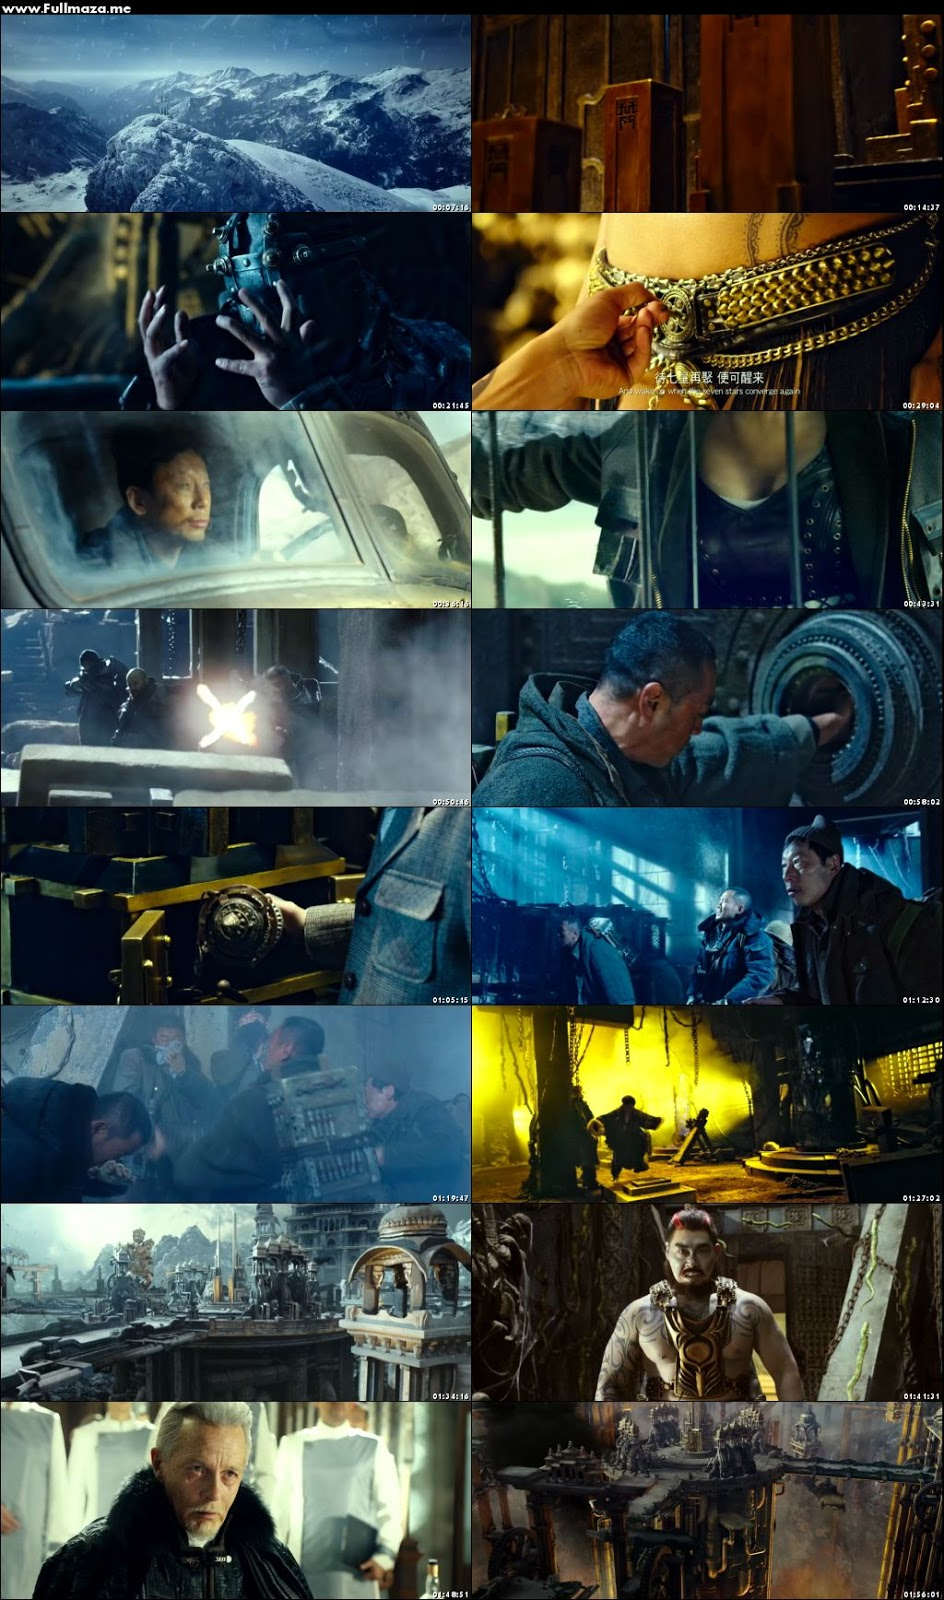 captain america the first avenger full movie in hindi download 480p khatrimaza